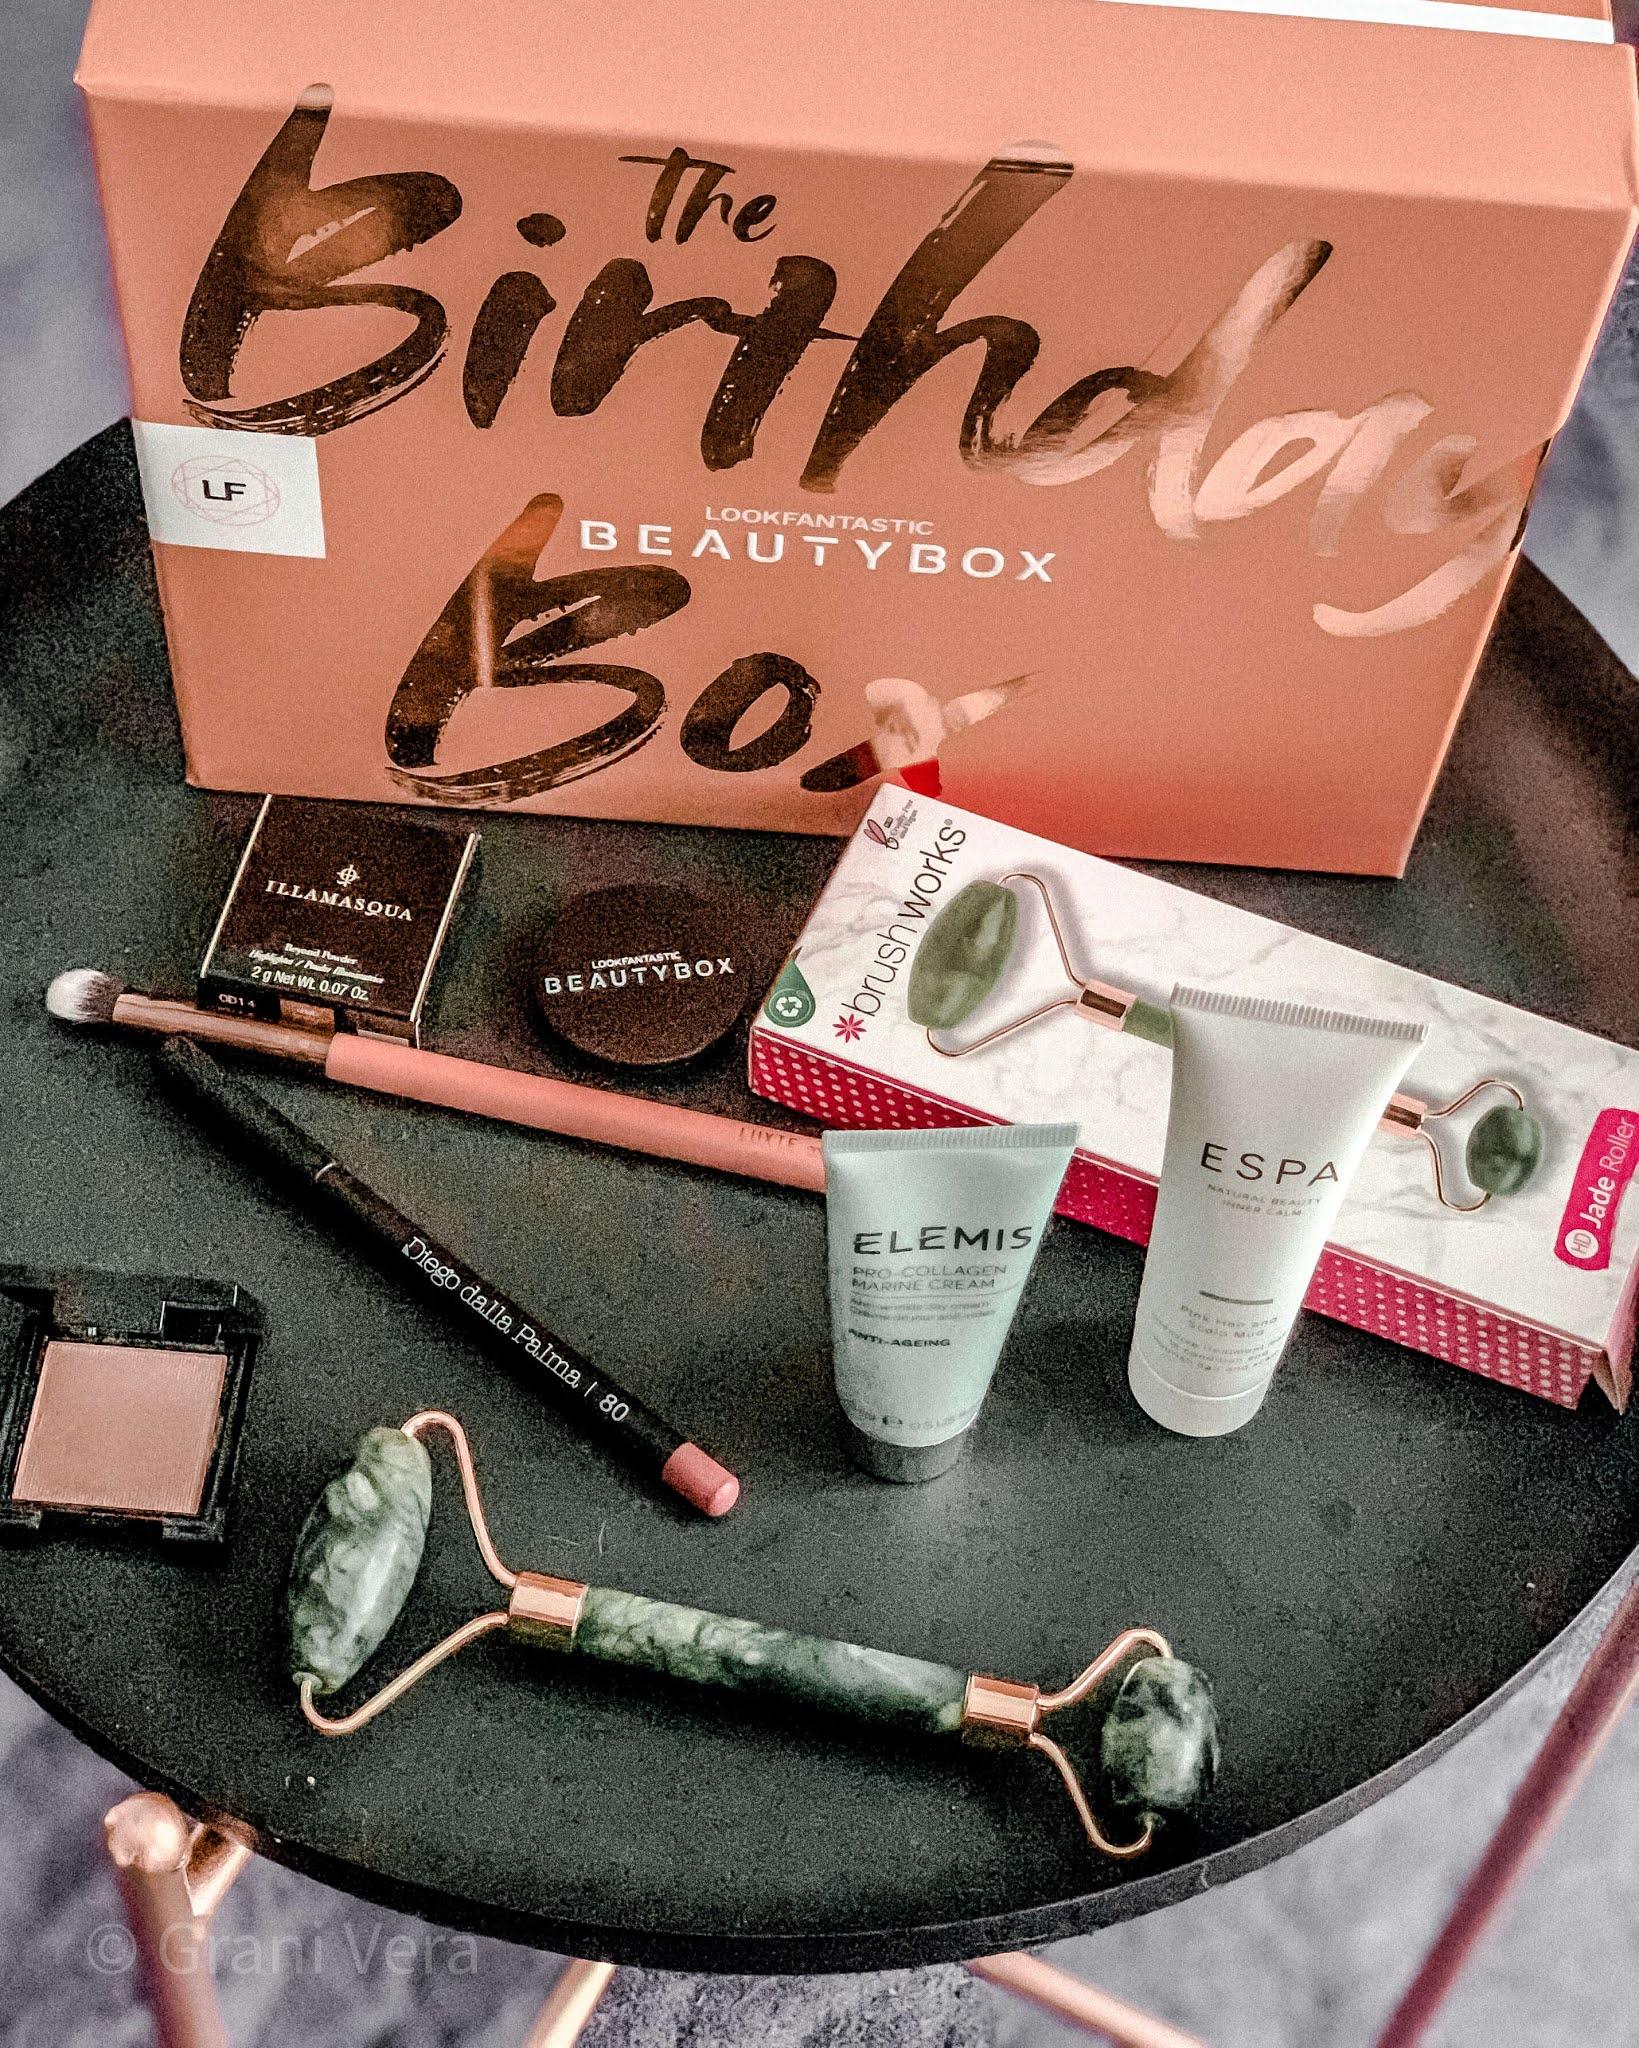 lookfanstastic-the-birthday-box